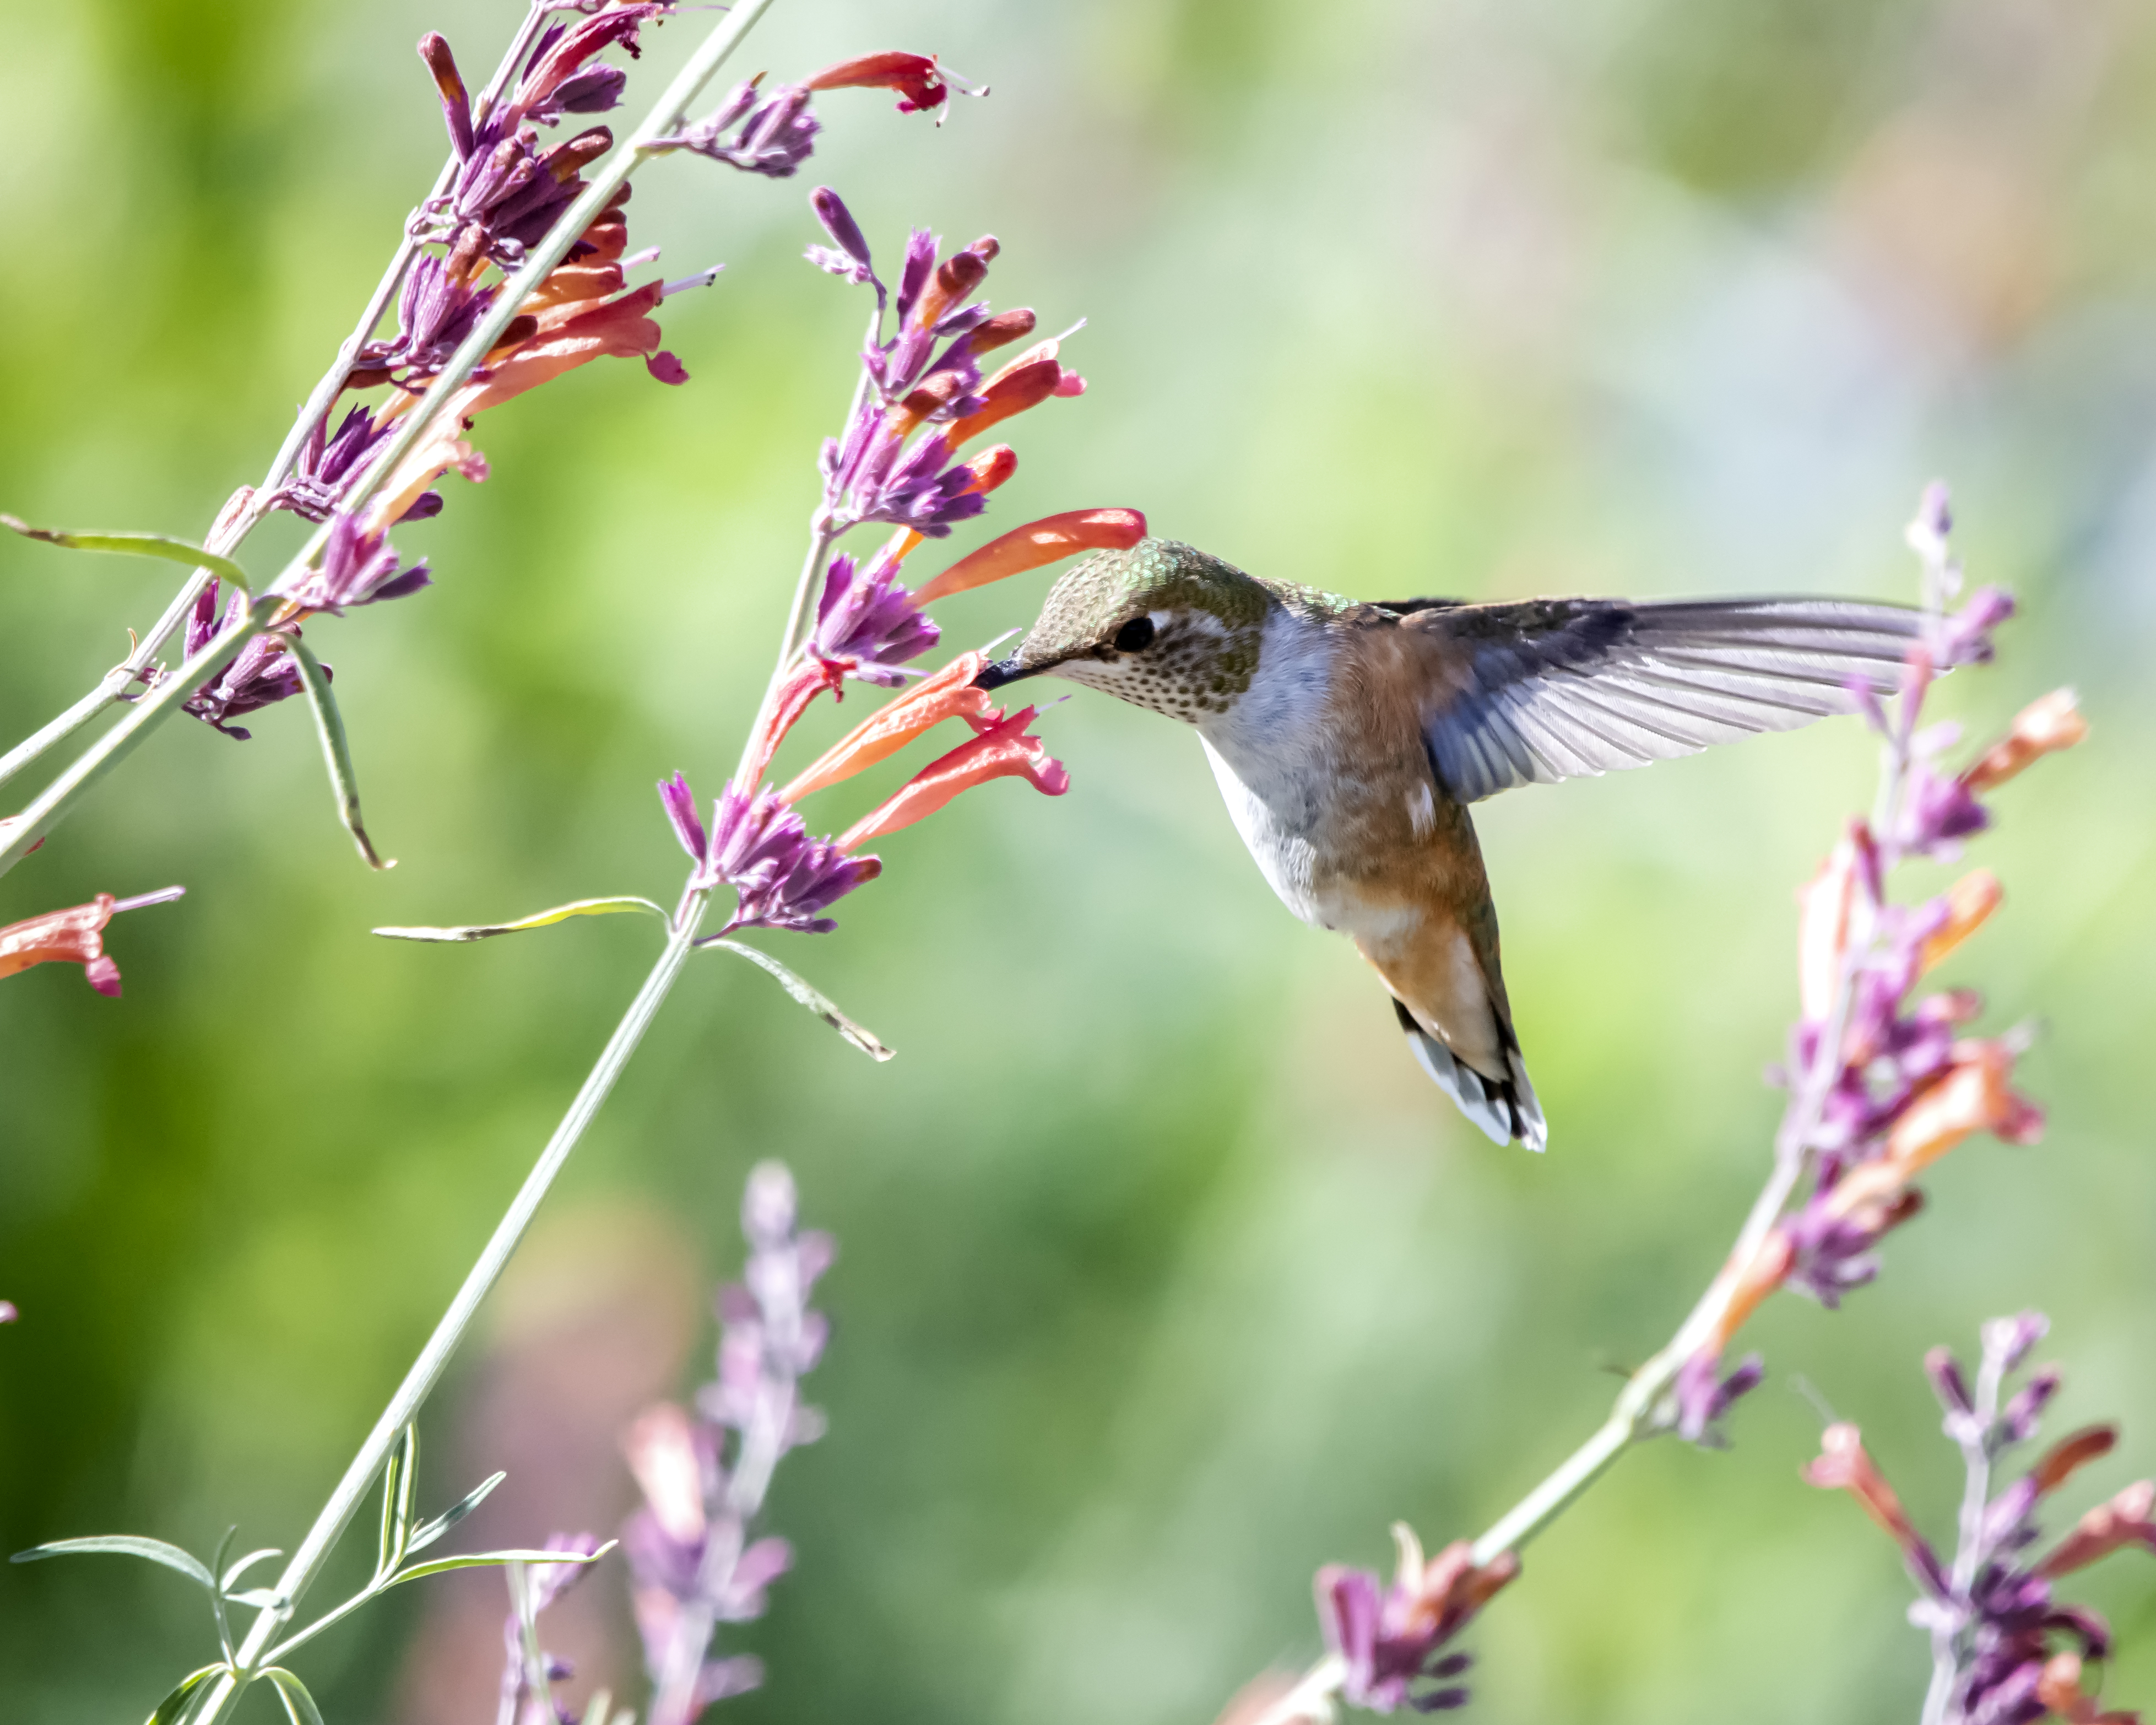 Close-Up Photo of Hummingbird Near Flowers